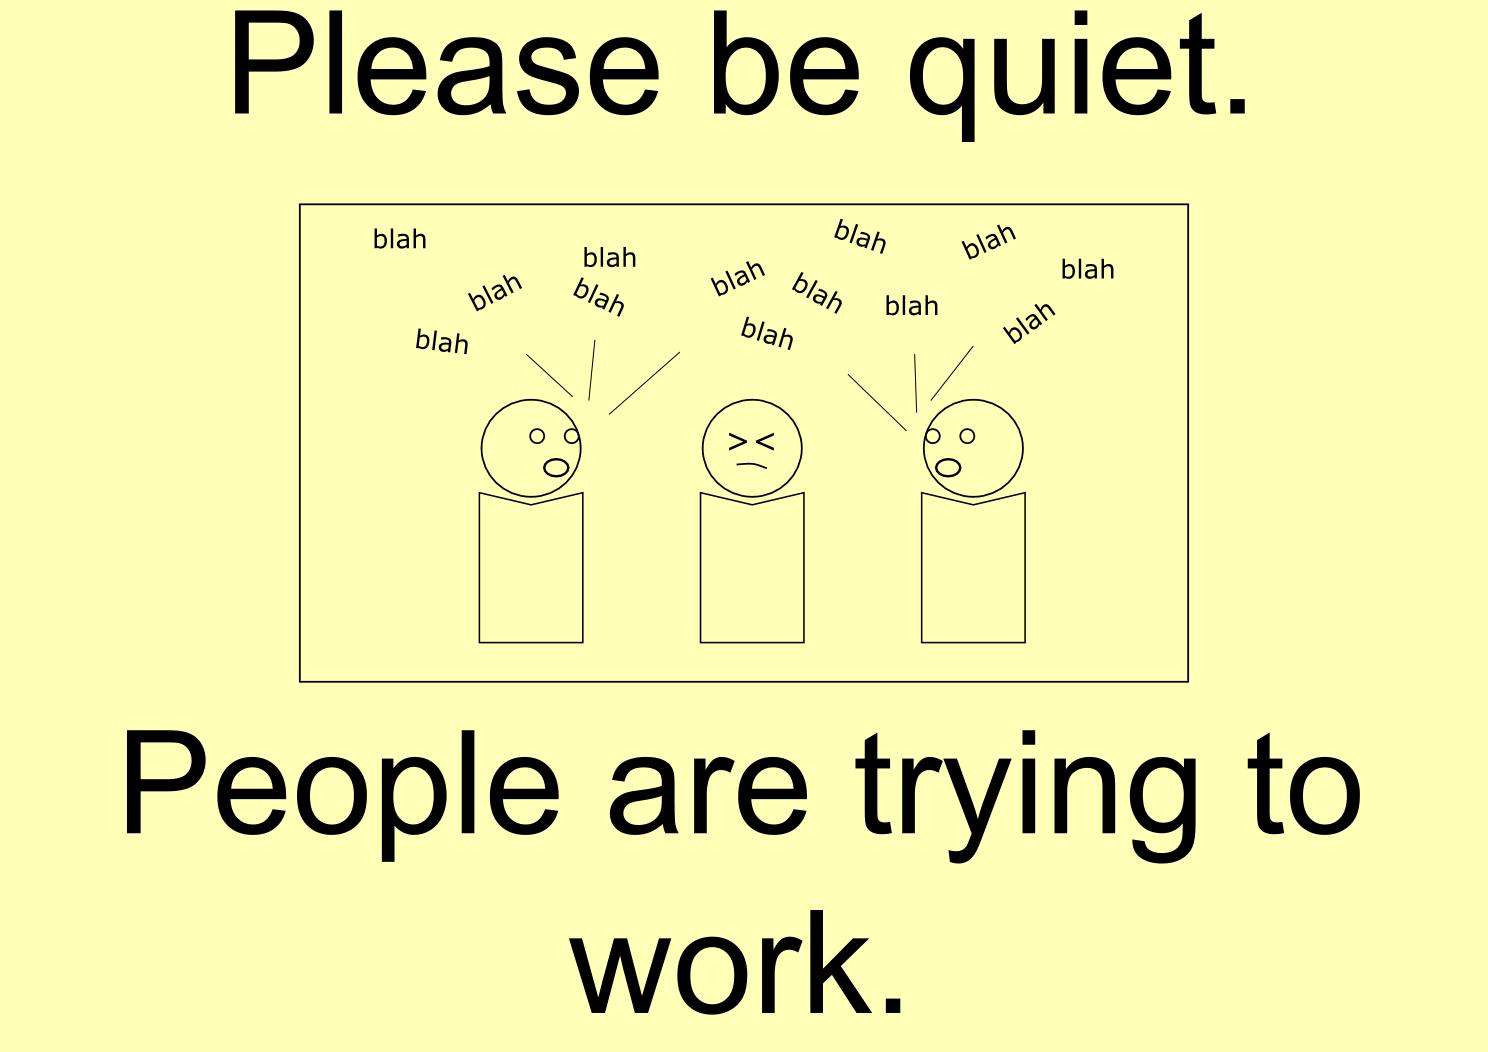 Quiet Please   Sign by StuartGilbert pngQuiet Please